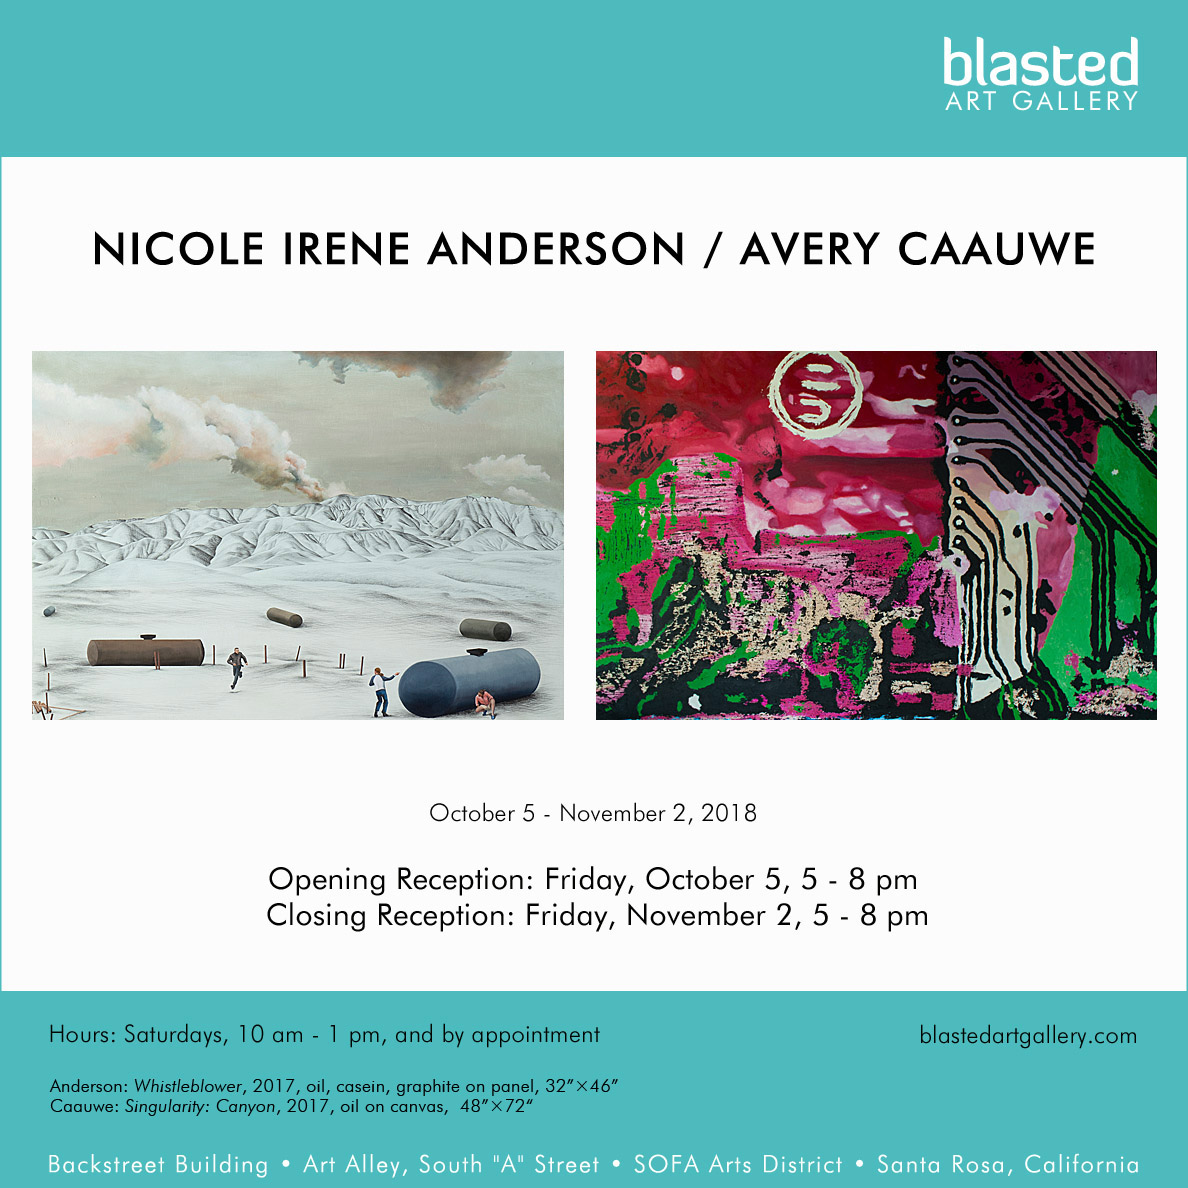 blasted-art-gallery_nicole-irene-anderson_avery-caauwe_opening-invitation.jpg